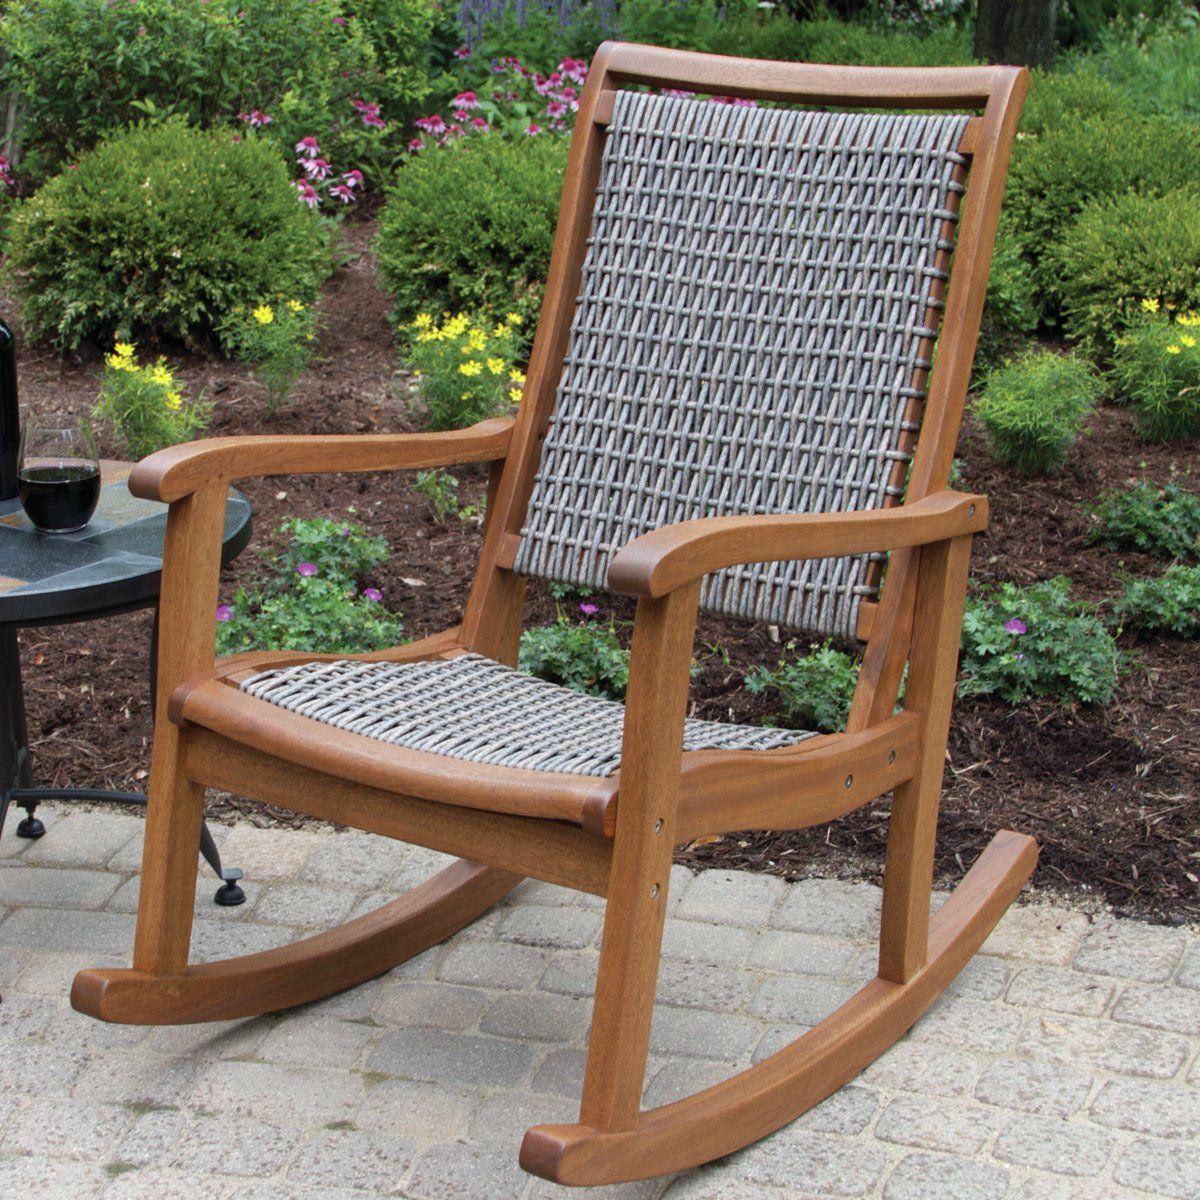 wayfair outdoor wooden rocking chair